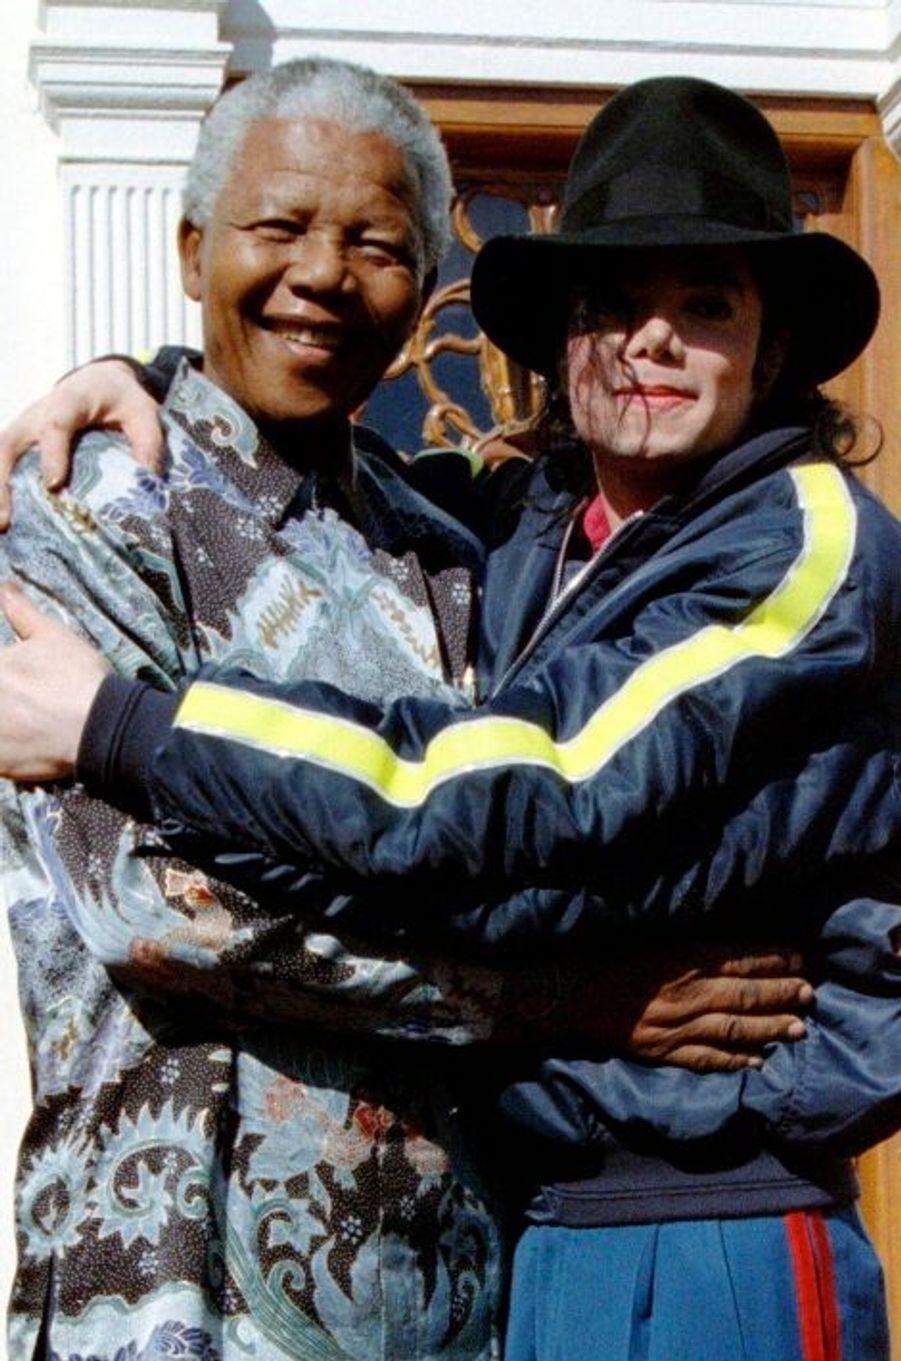 Avec Michael Jackson, en juillet 1996